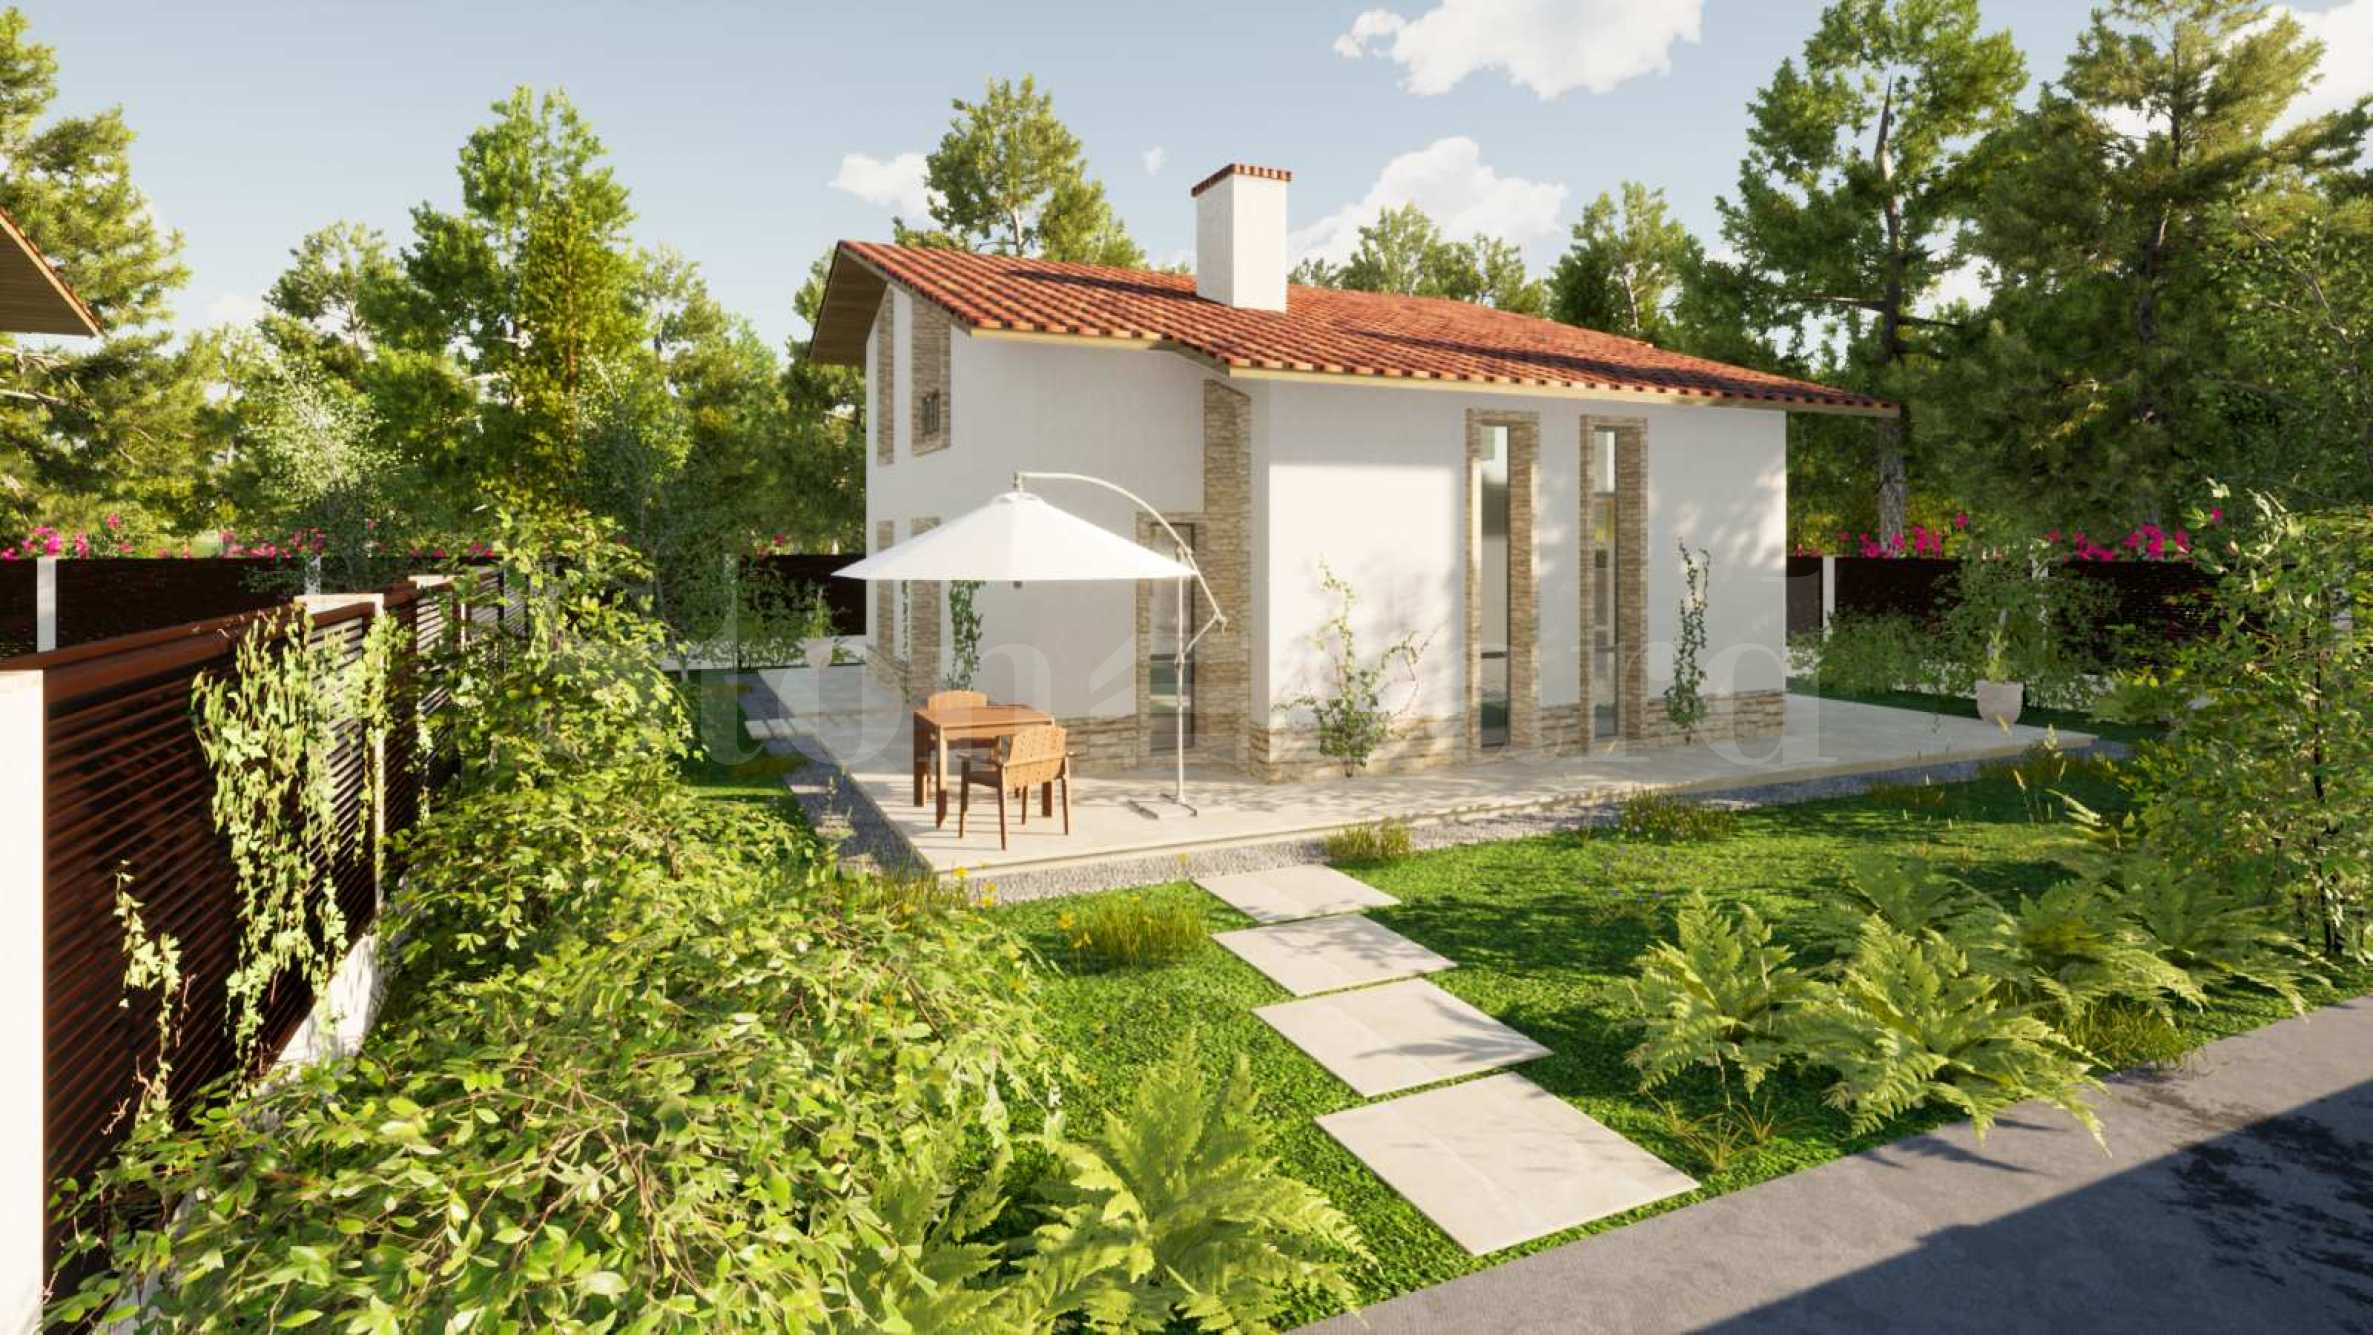 House in Gurmazovo1 - Stonehard